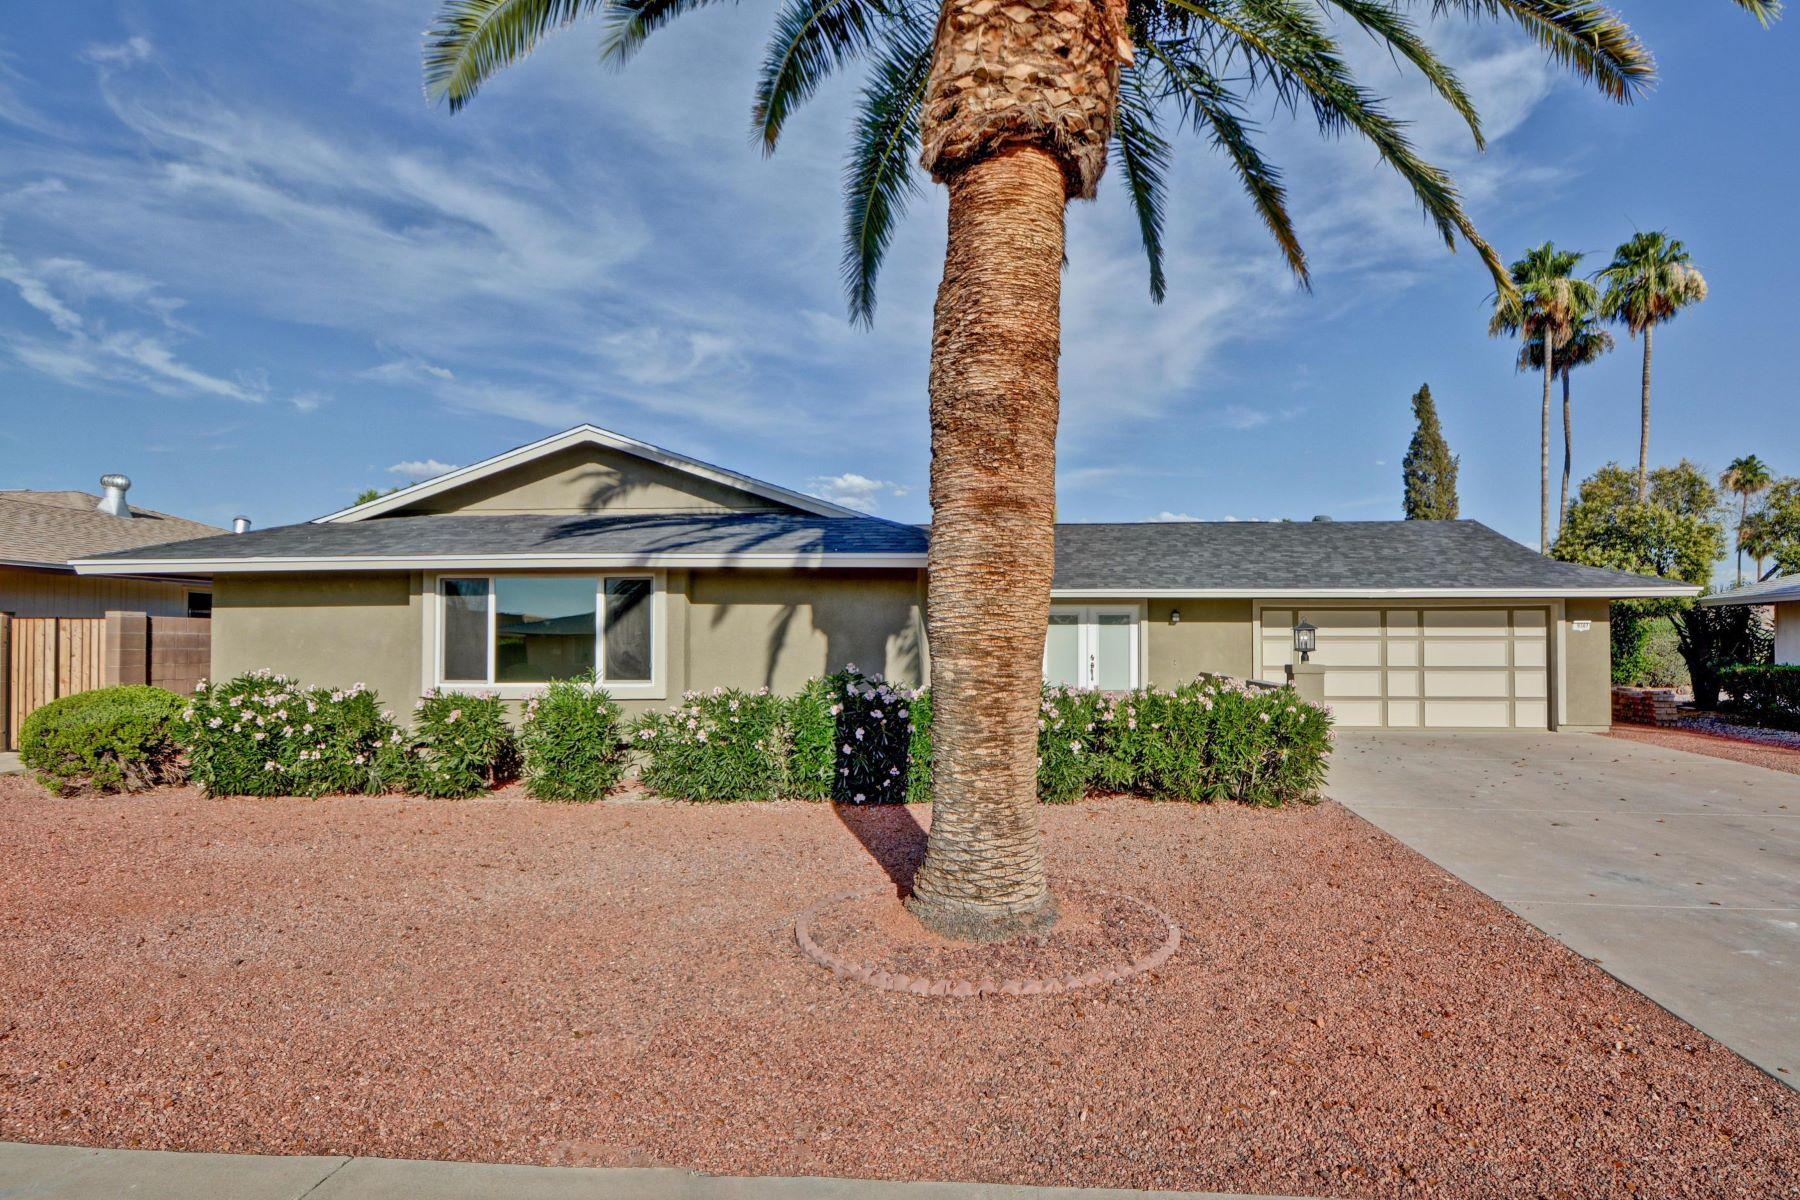 Single Family Homes for Sale at Sun City 9307 W GLEN OAKS CIR Sun City, Arizona 85351 United States